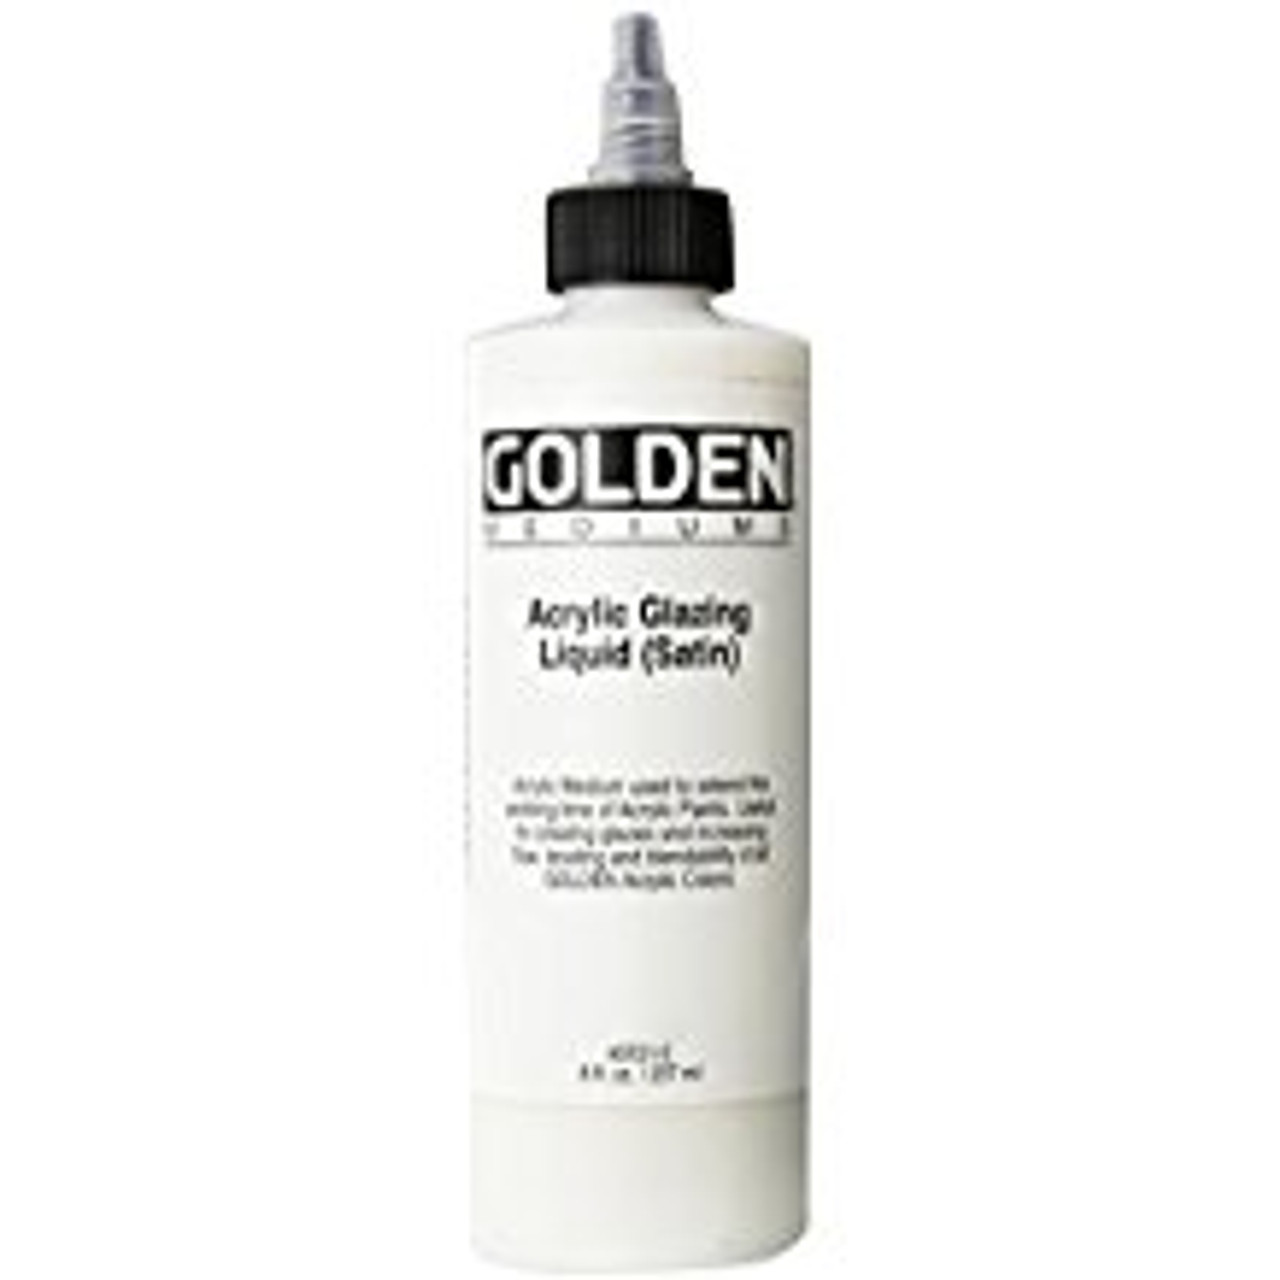 Golden Additives Acrylic Glazing Liquid